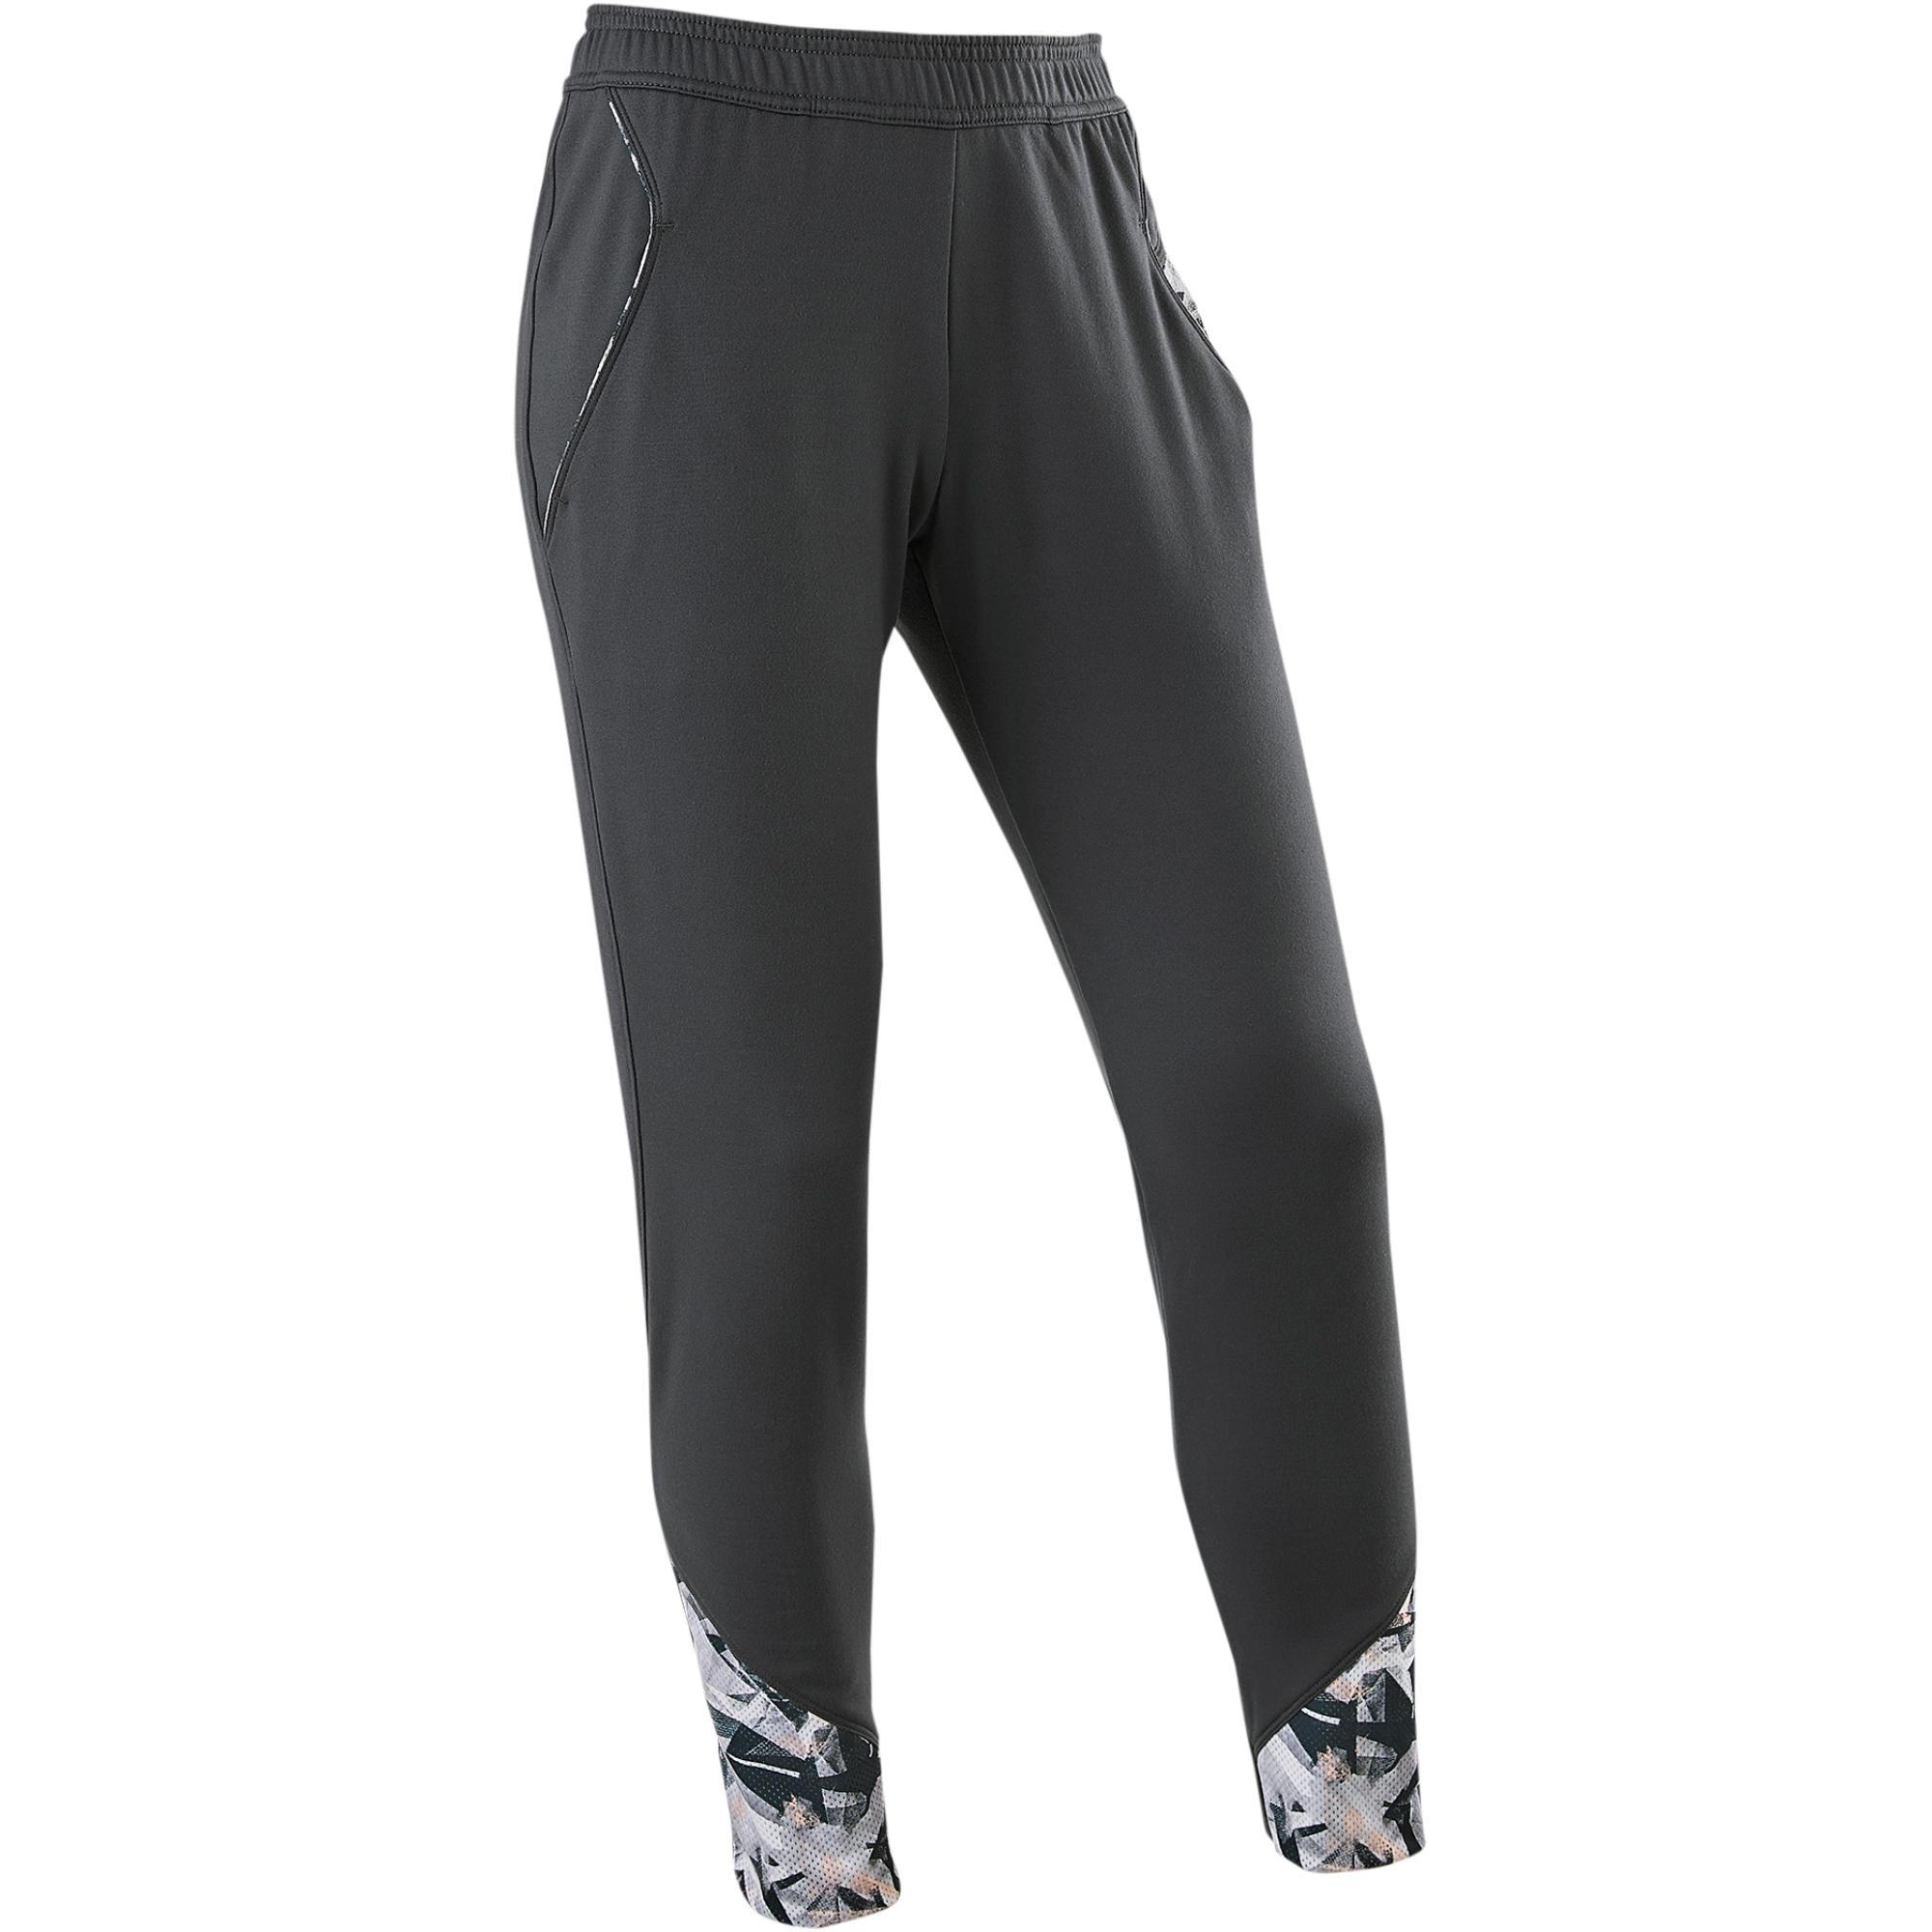 Pantalón cálido transpirable regular S900 niña GIMNASIA JÚNIOR gris estampado